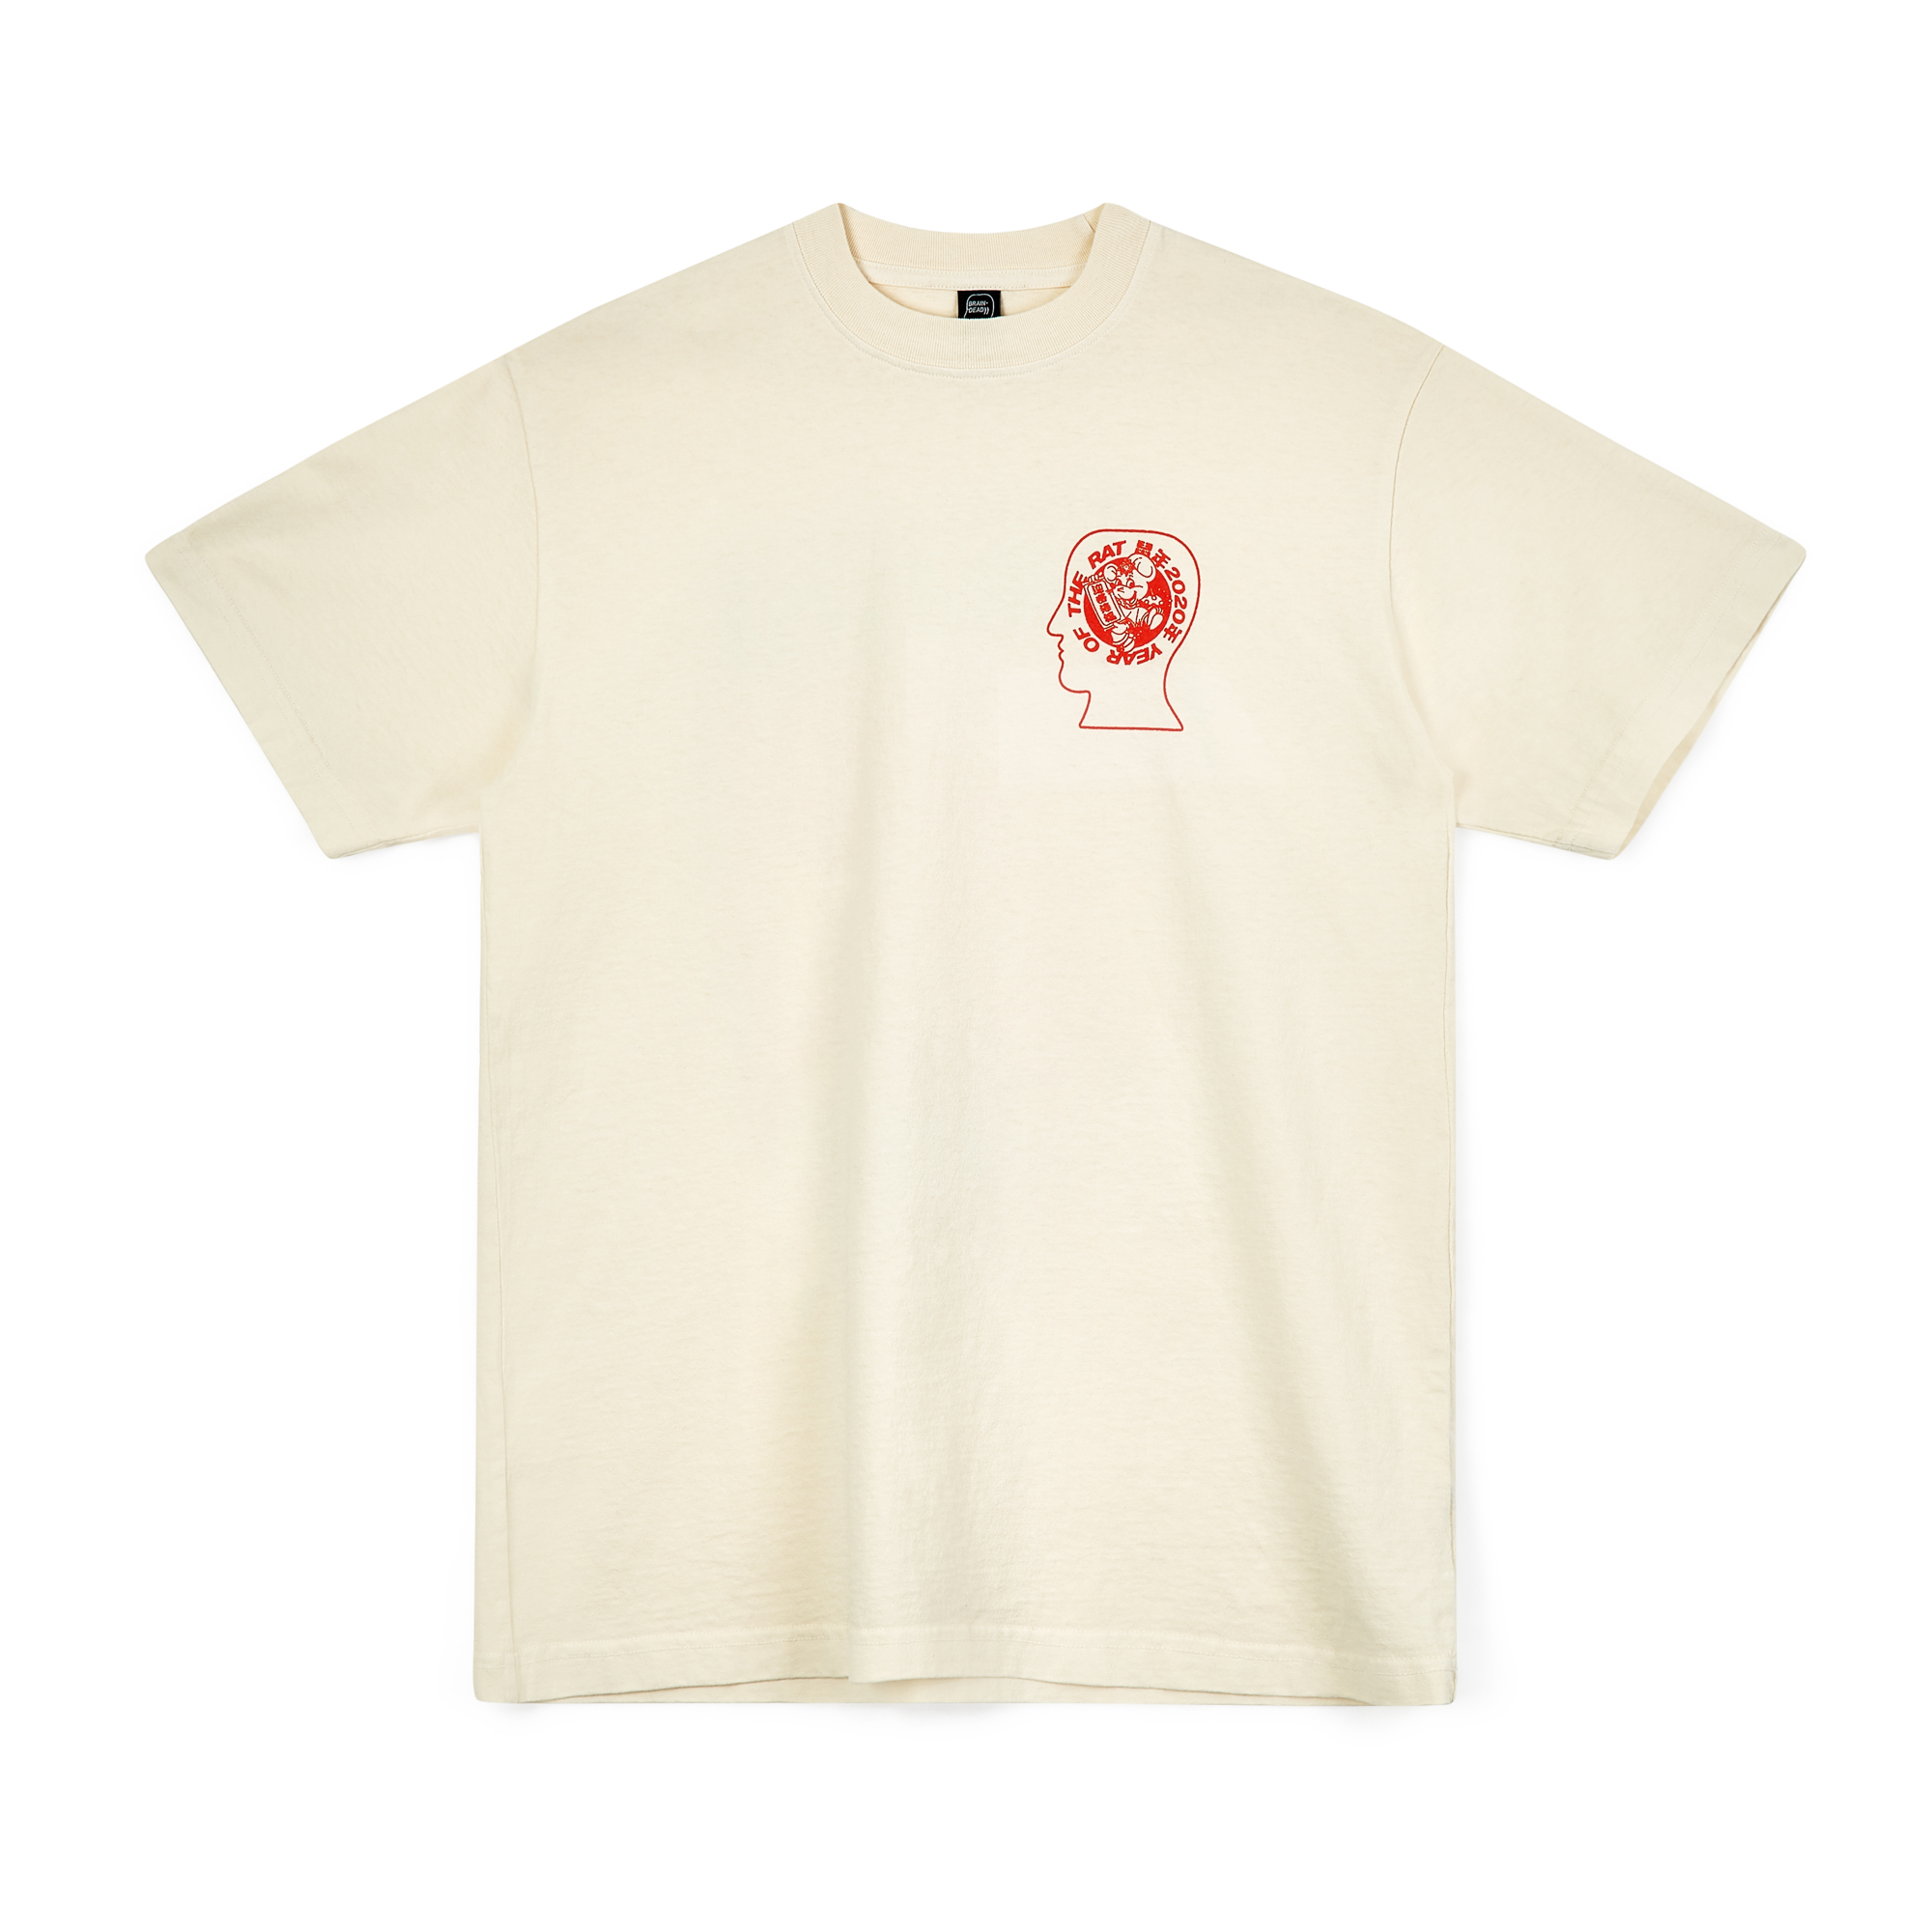 YOTR-T-shirts_BrainDead_129.jpg